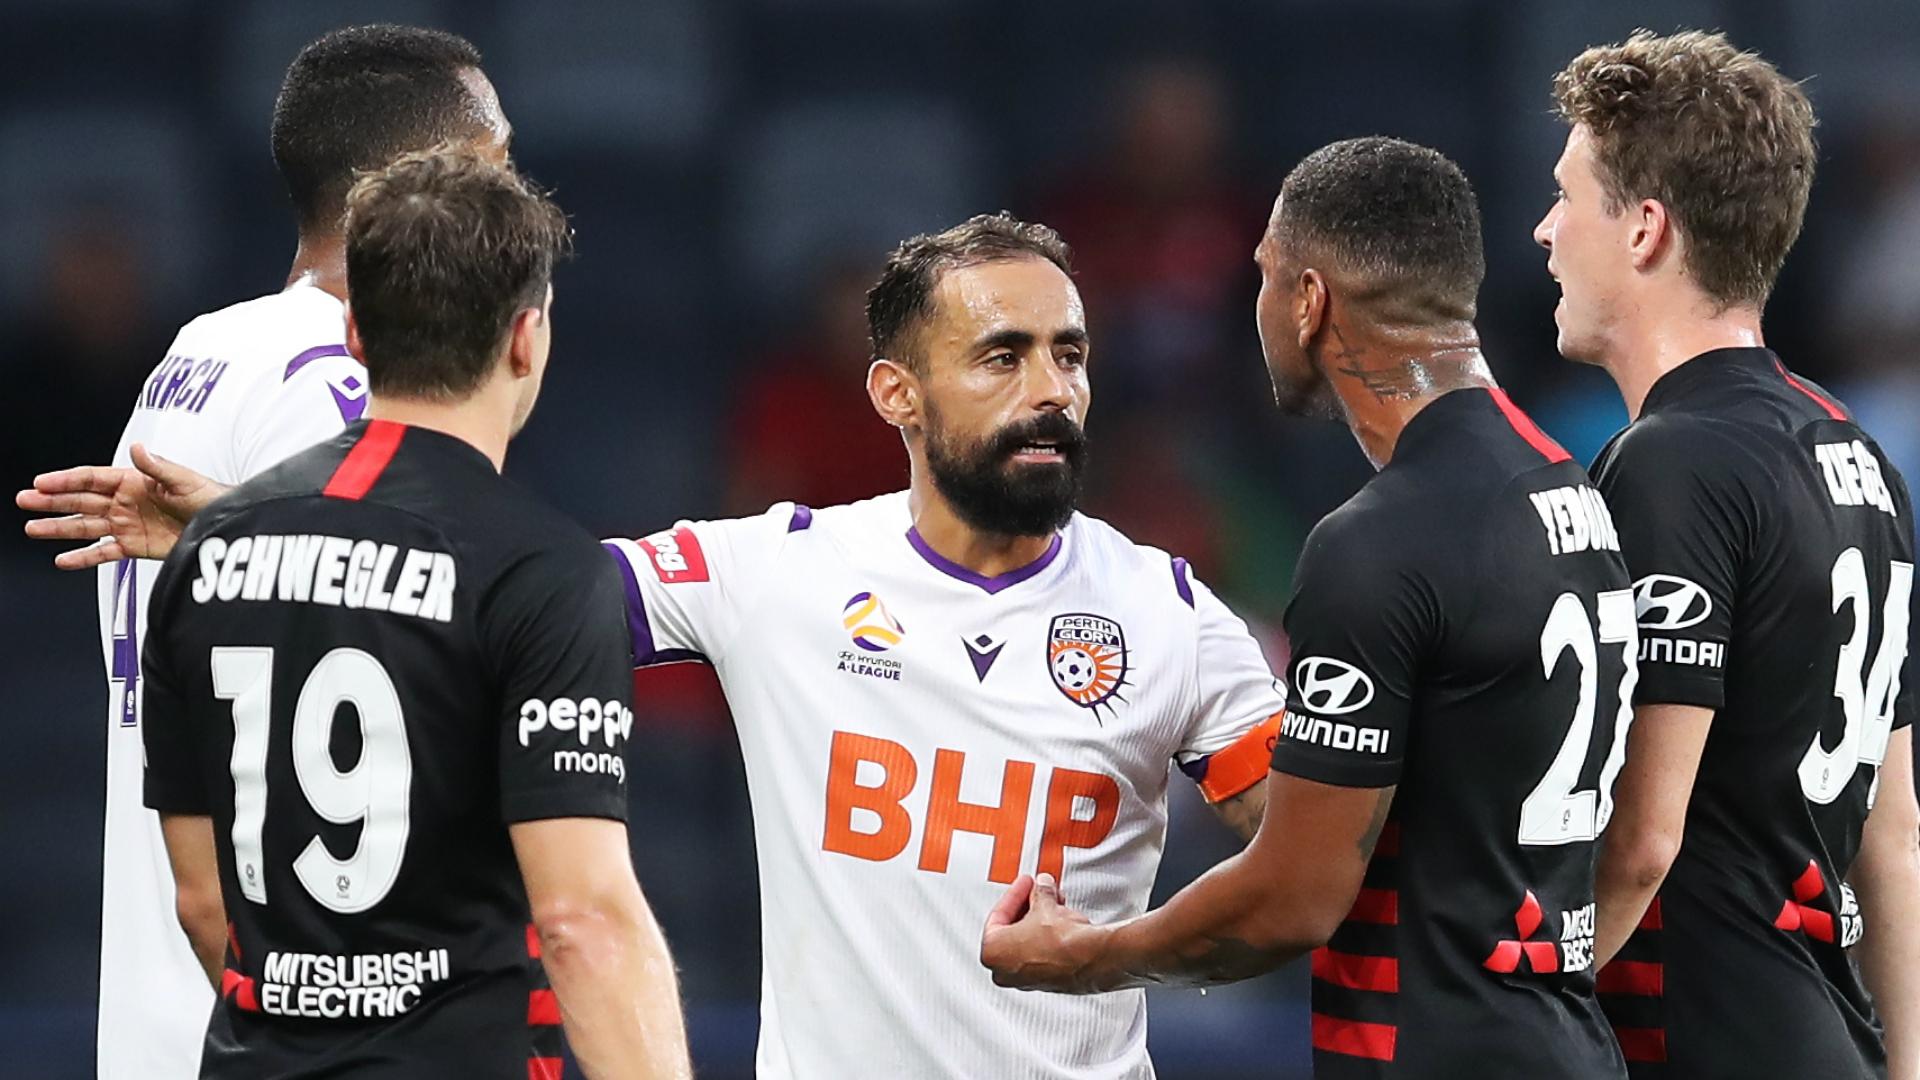 A-League Review: Wanderers woes continue, Berisha bamboozles Mariners